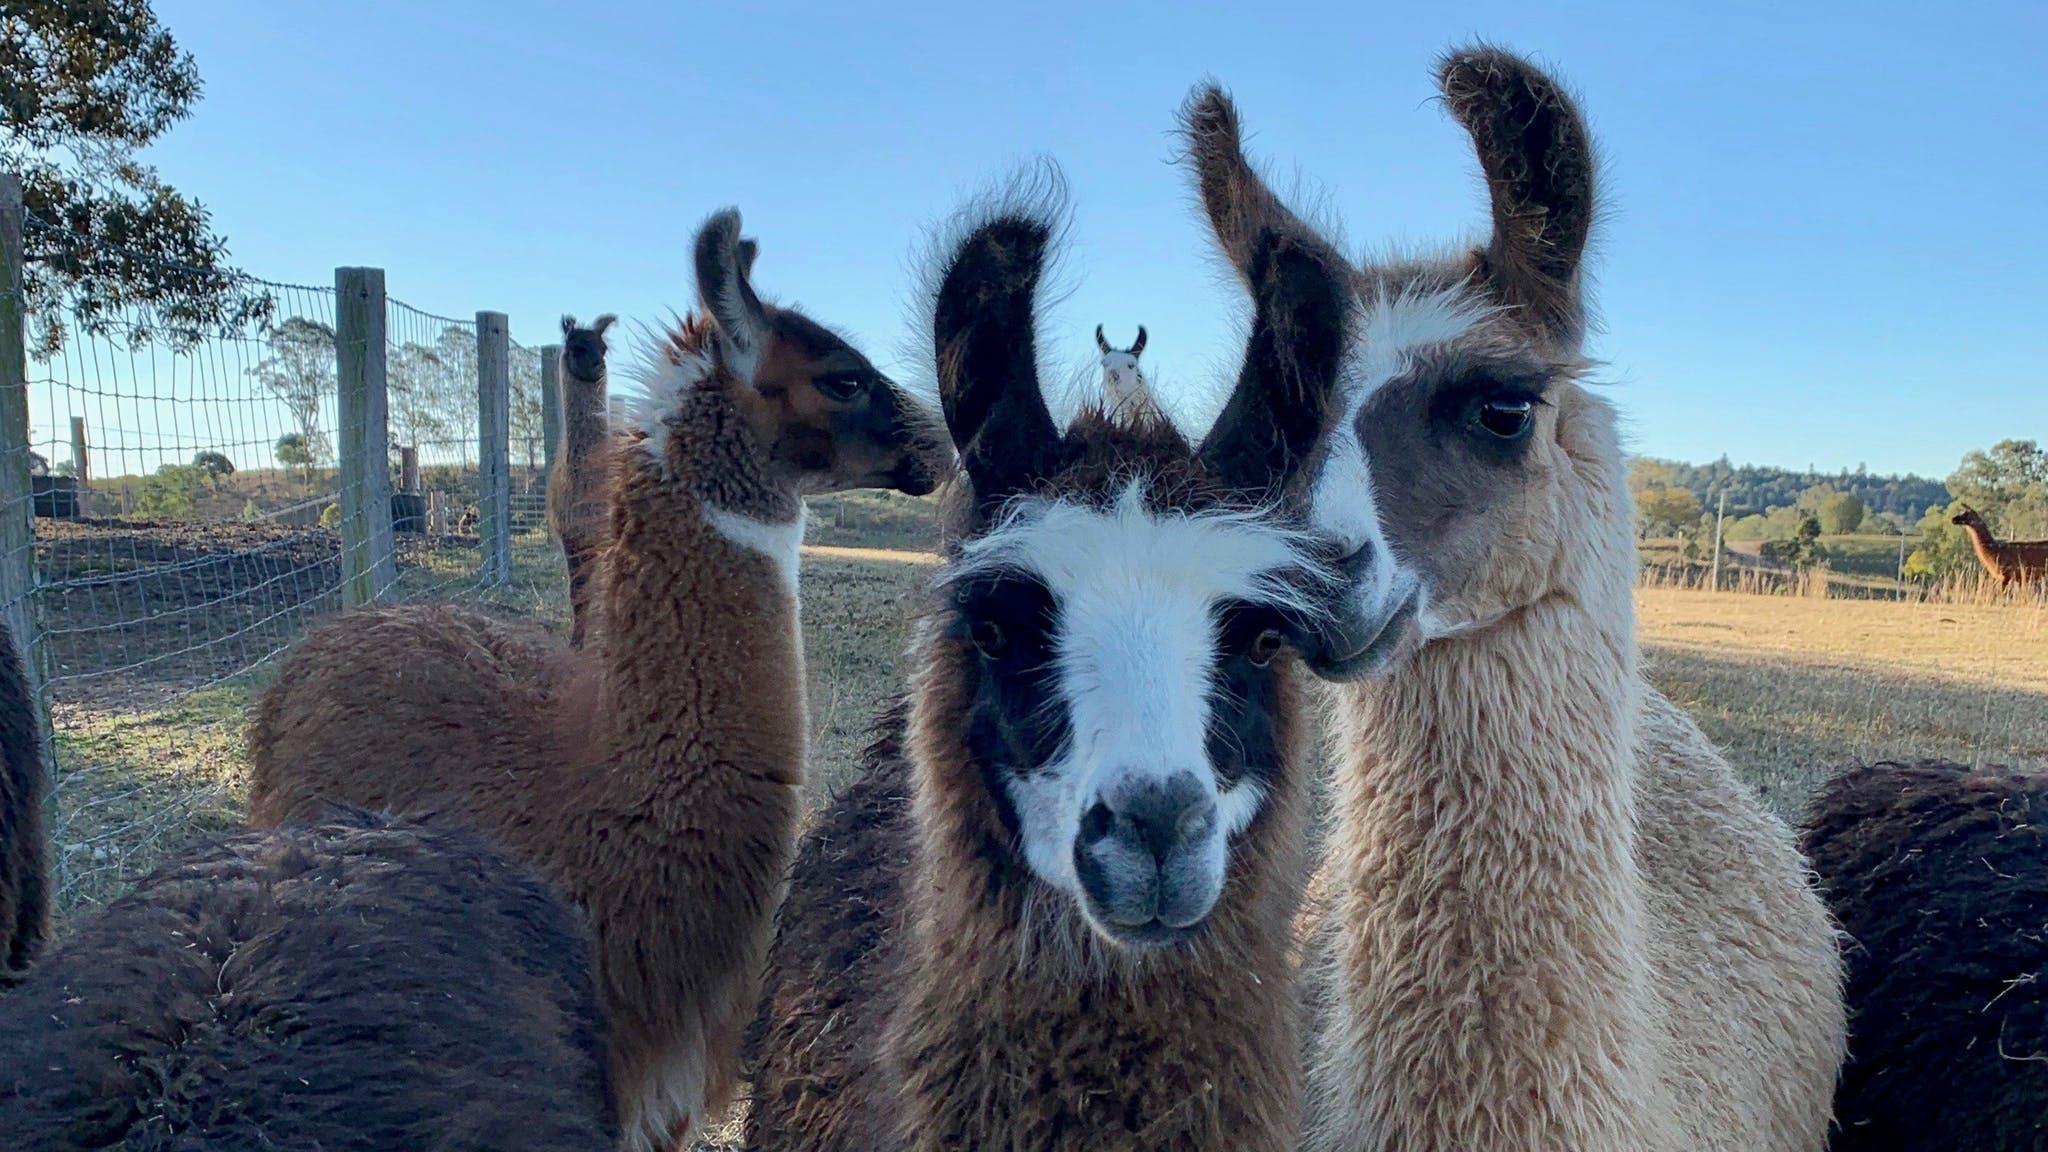 The Llama Farm Discover Ipswich